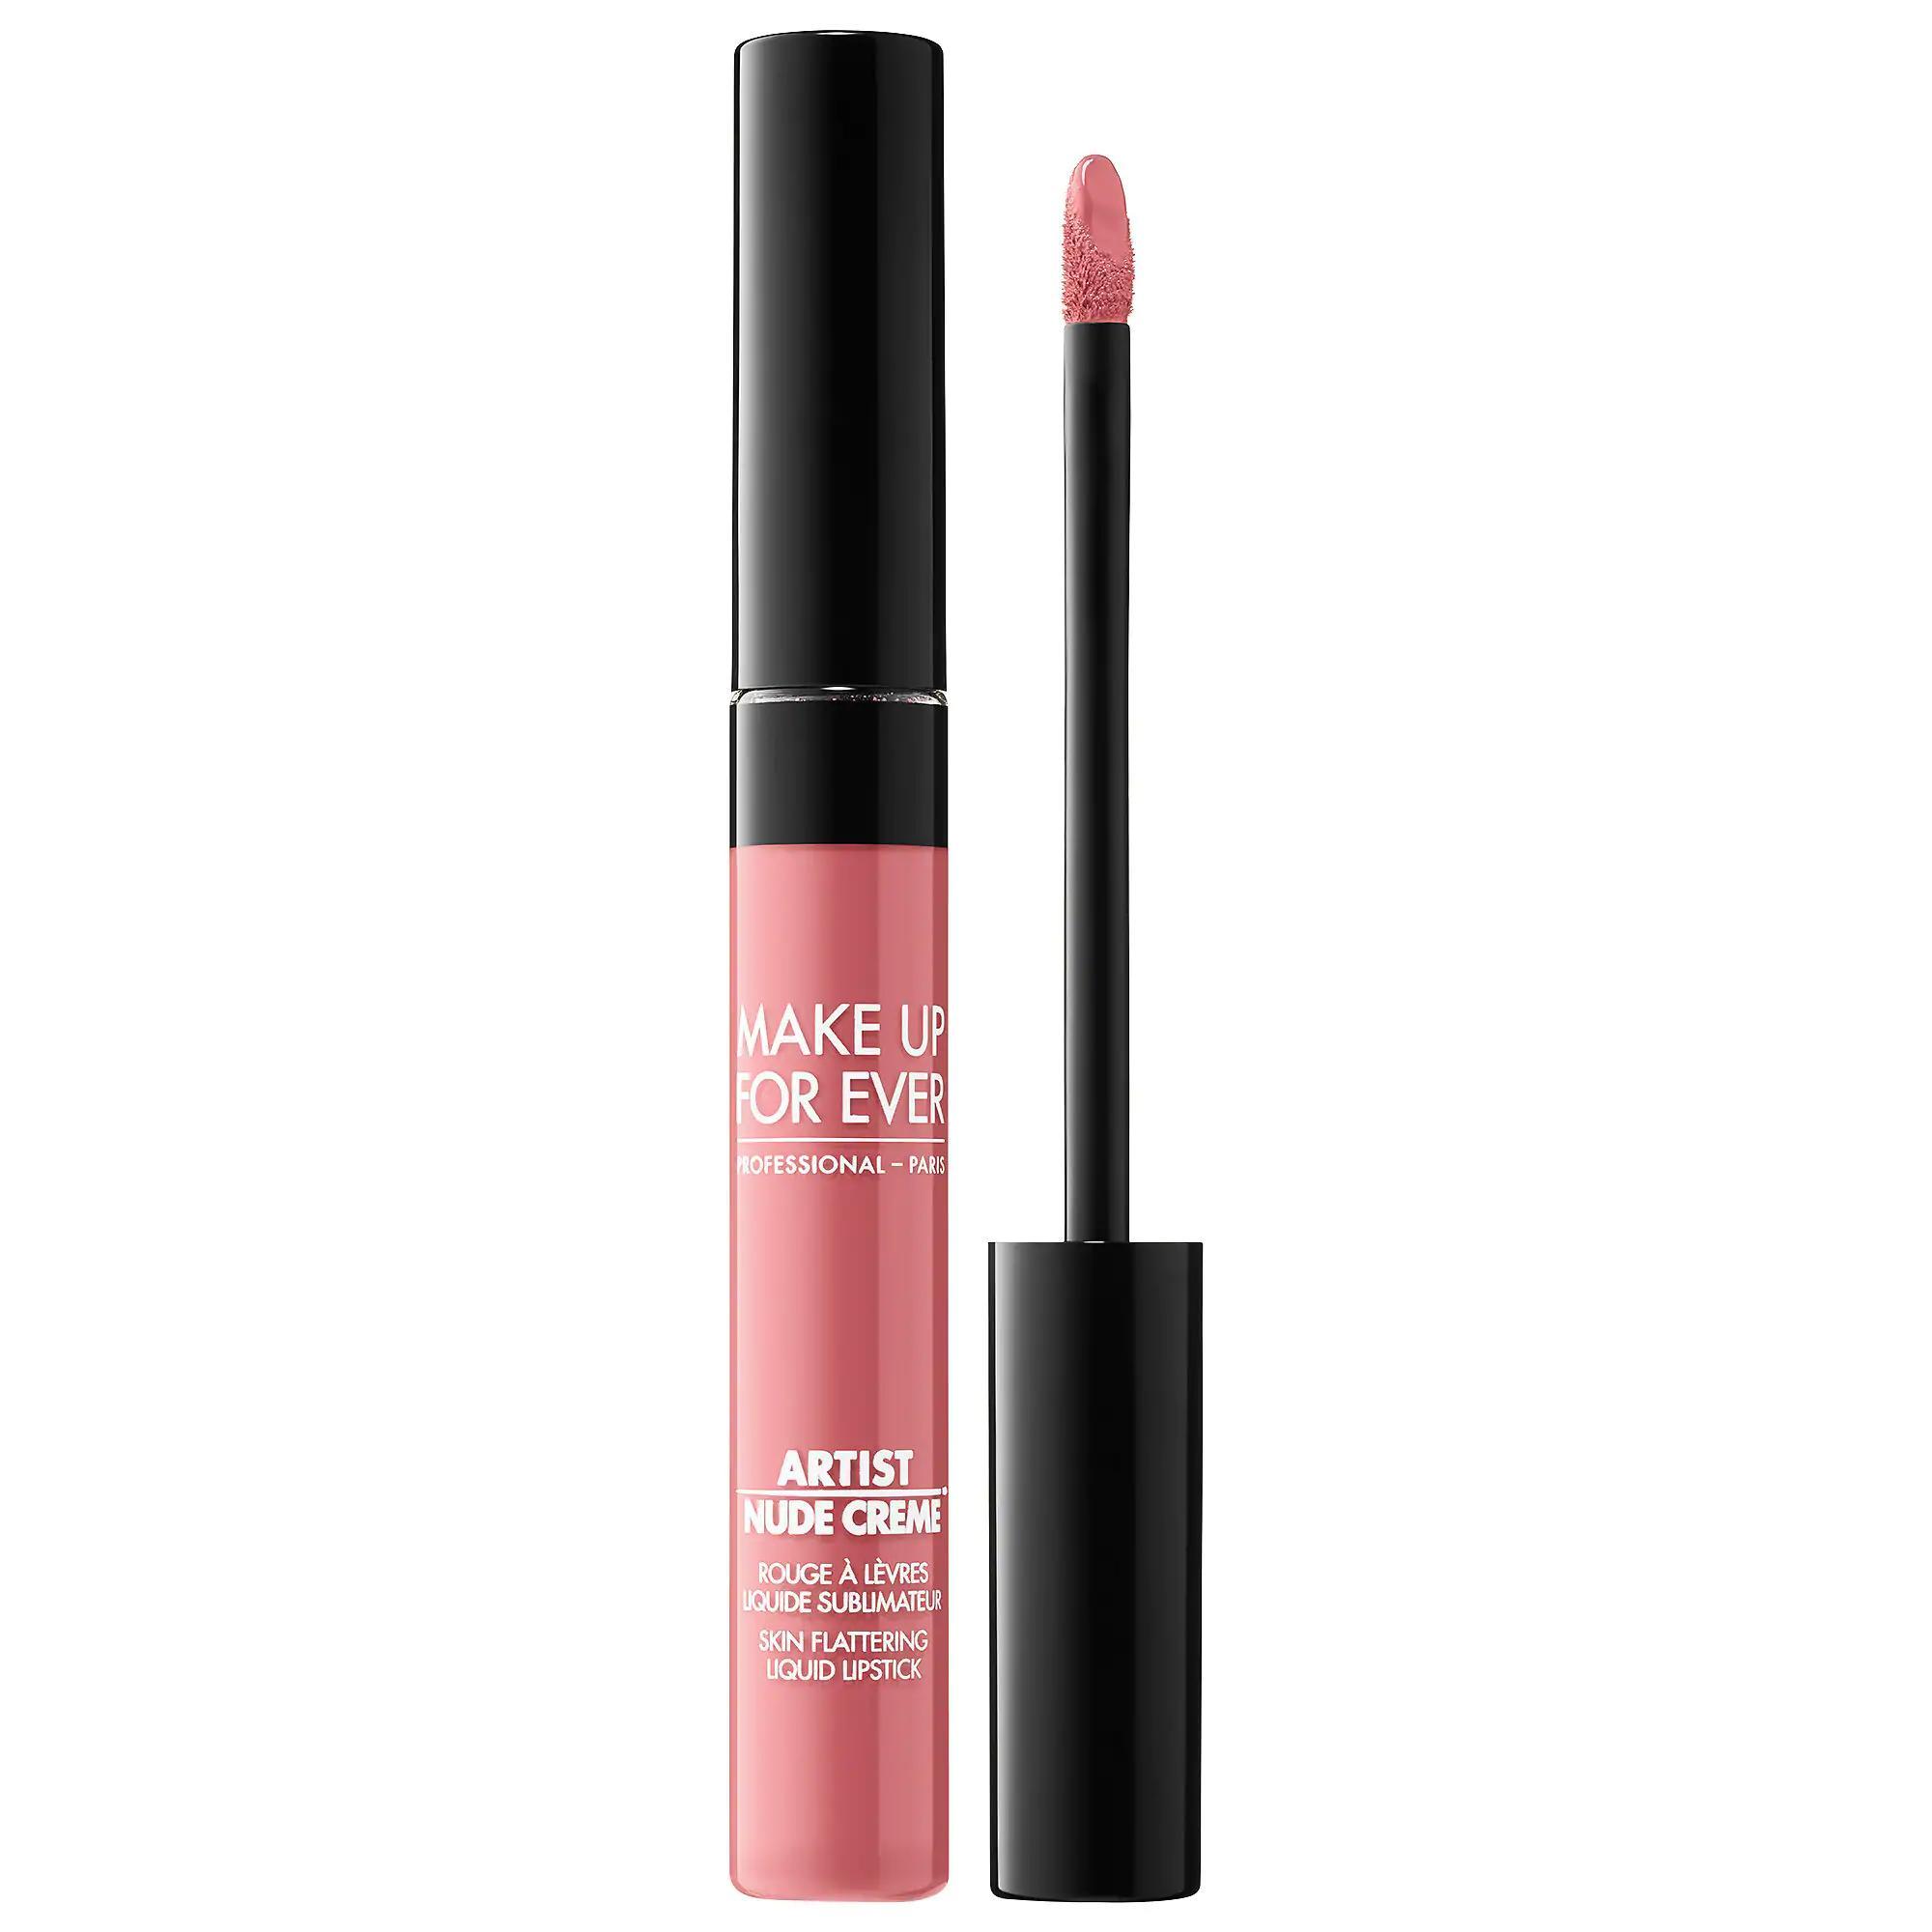 Makeup Forever Artist Nude Creme Liquid Lipstick Flesh 2